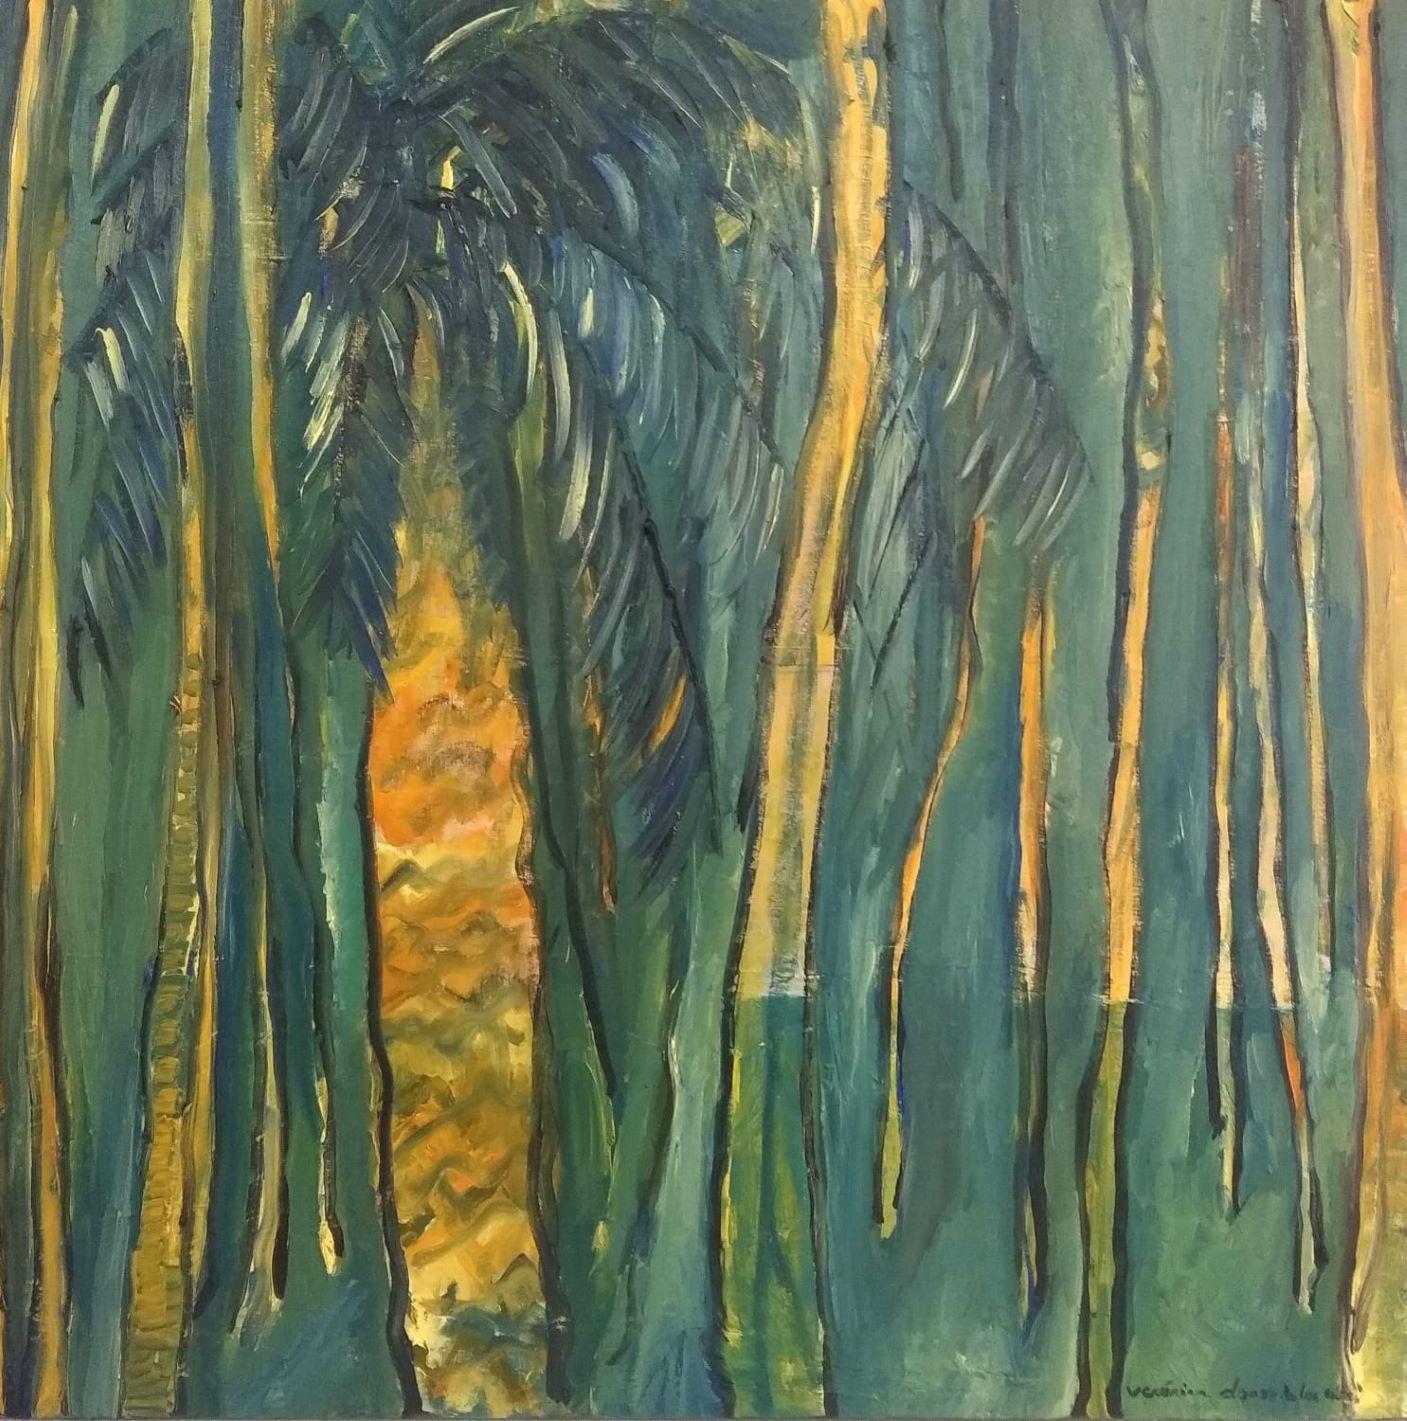 Jungle with palm_VeronicaAlonsodelosRios